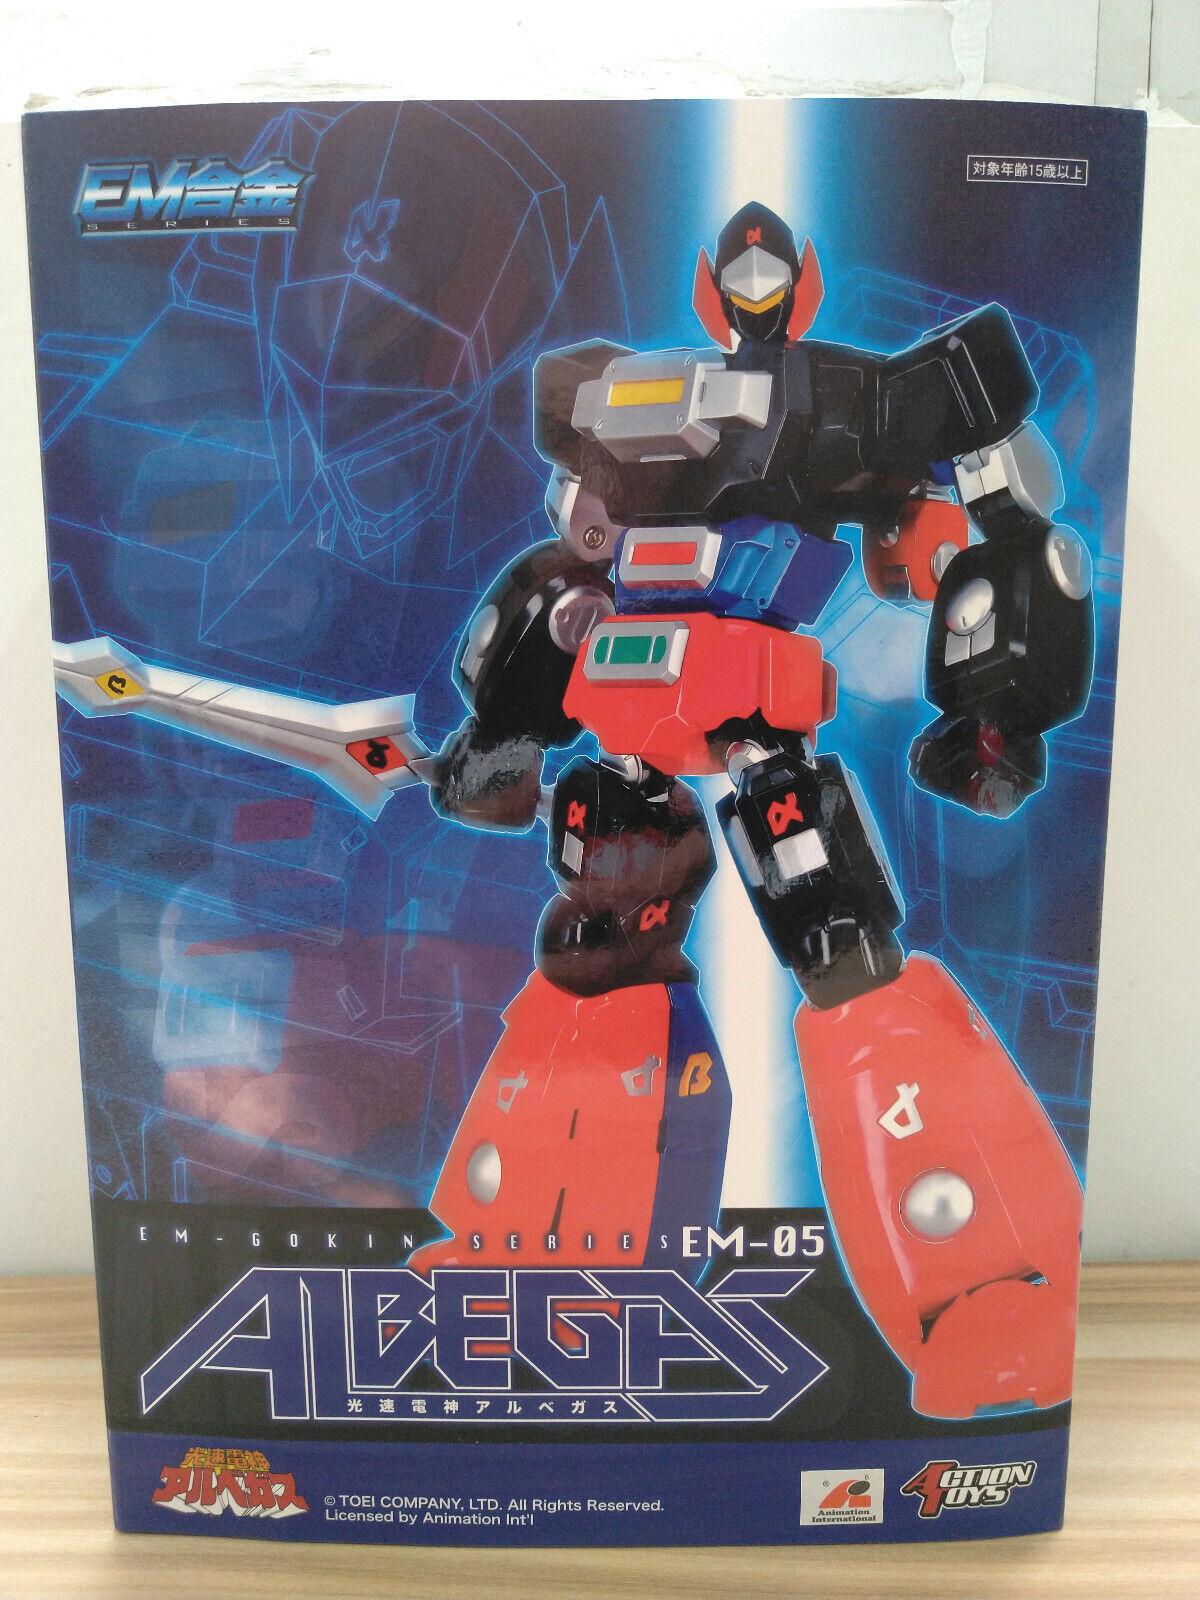 Action Toys EM-Gokin Series Lightspeed Electroid Albegas Action Figure EM-05